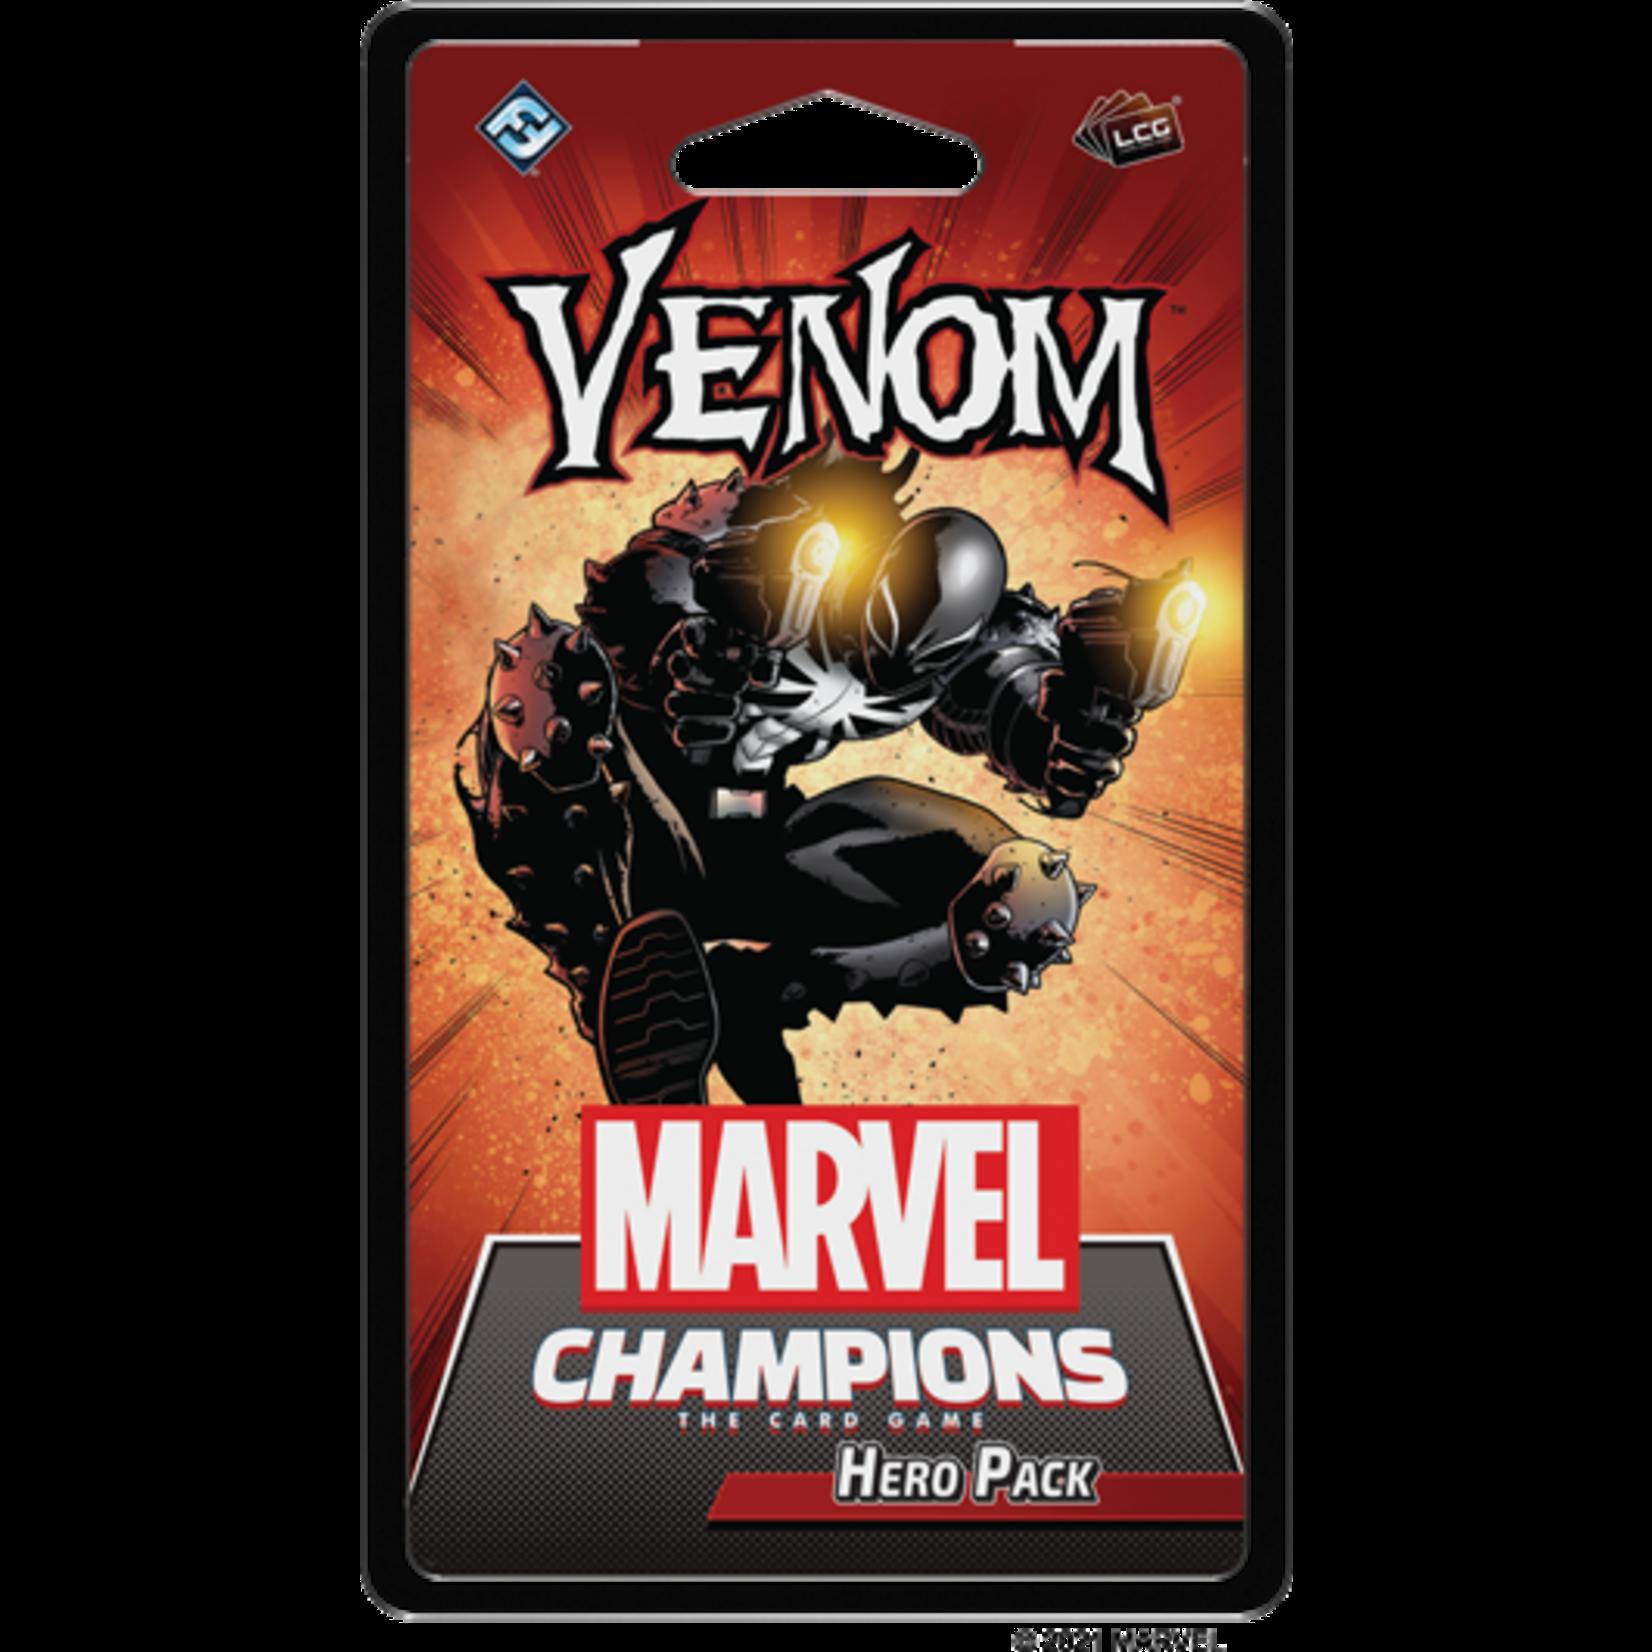 Fantasy Flight Games Marvel Champions Living Card Game: Venom Hero Pack (Preorder)